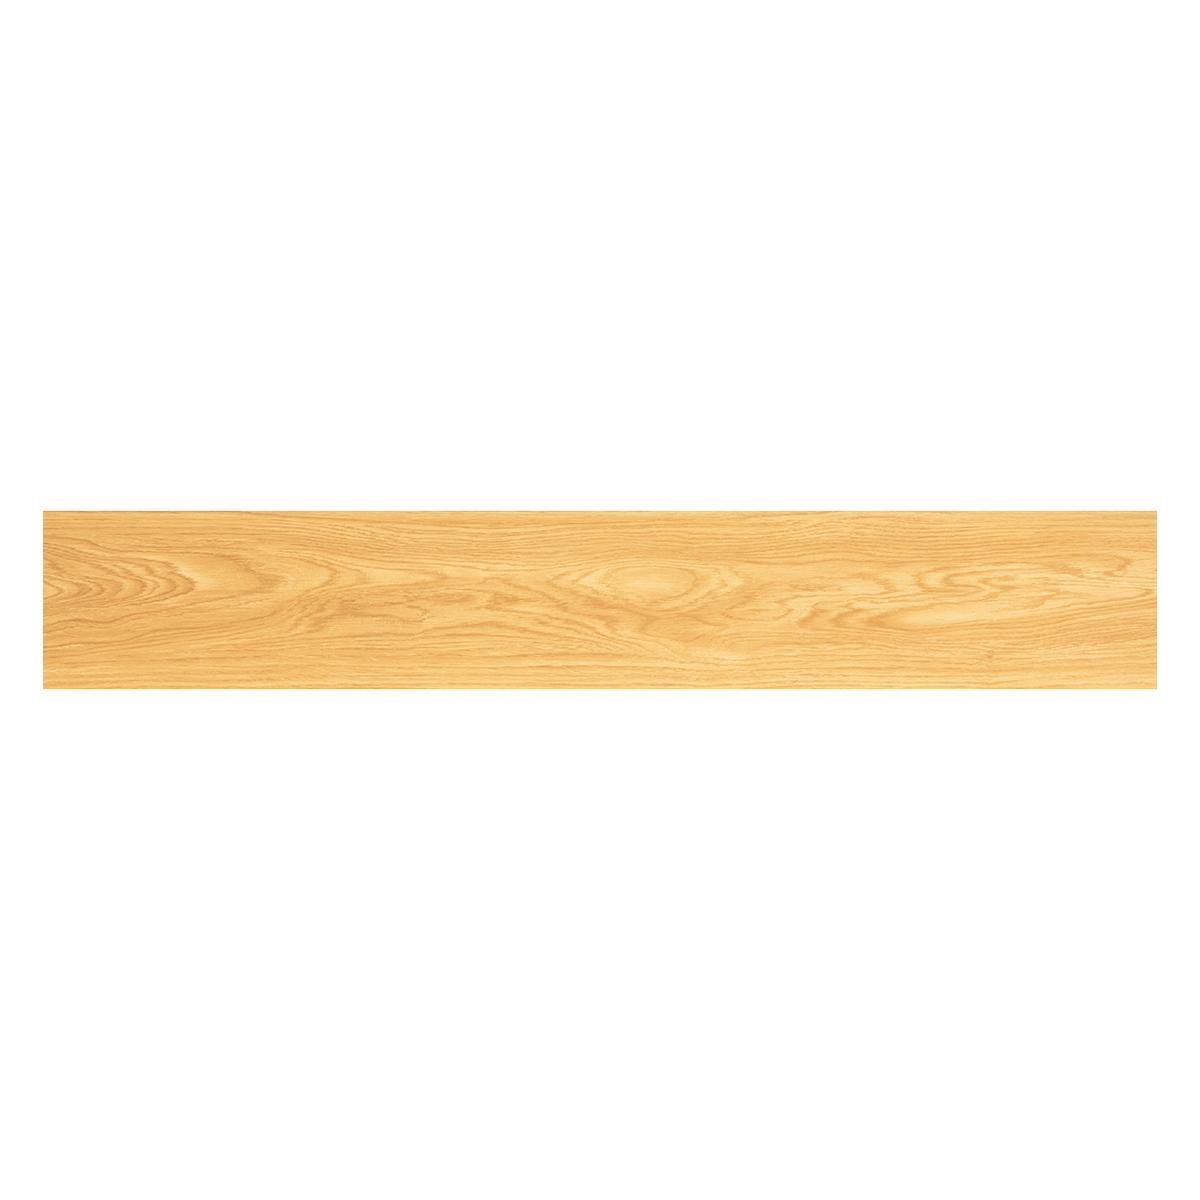 Piso Laminado Naturally Country Mate - 19.9X121.5 - 2.90 m2